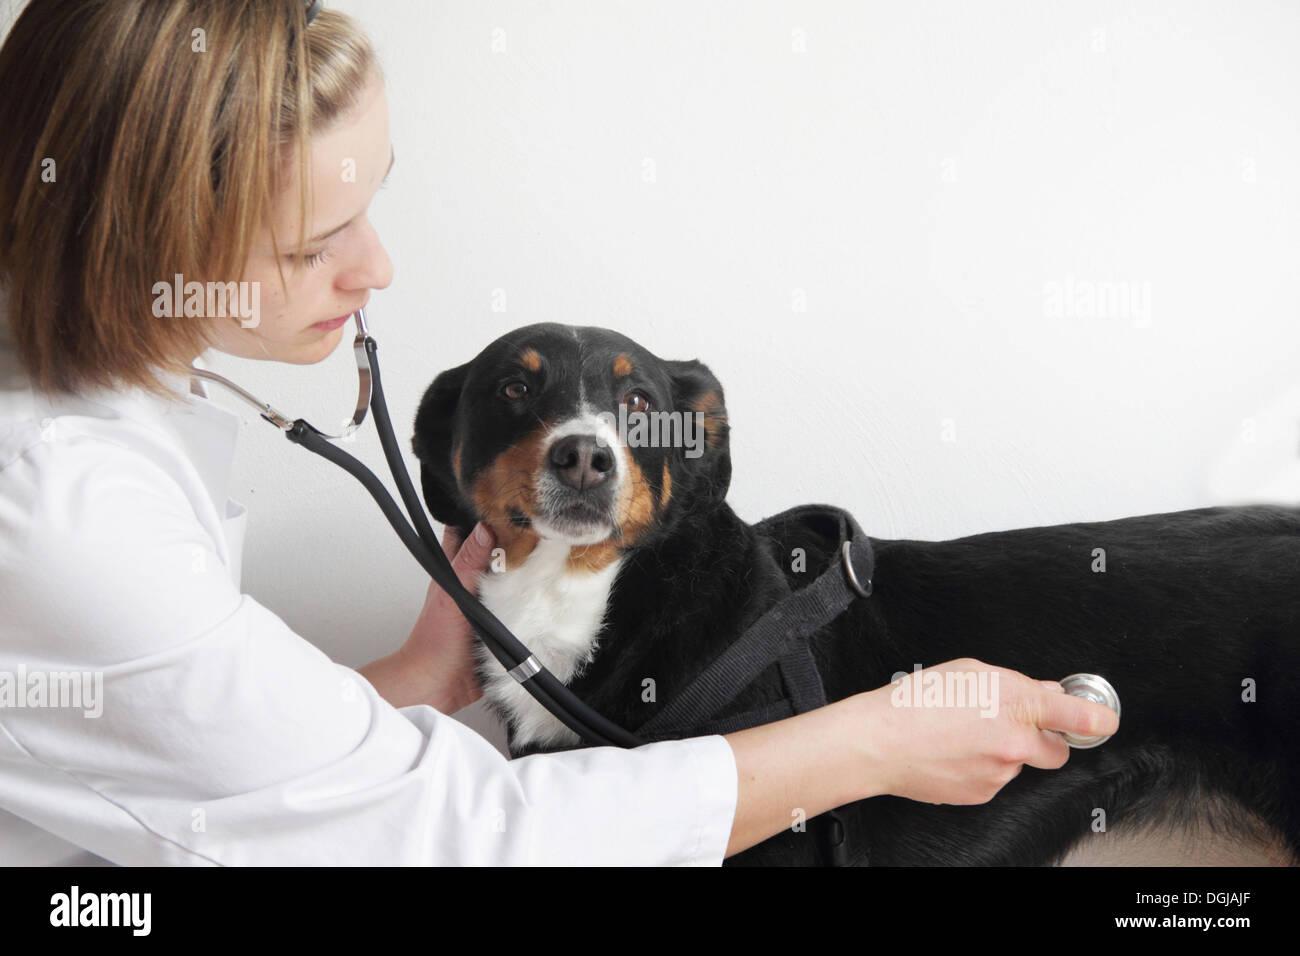 Female veterinarian examining dogs chest - Stock Image